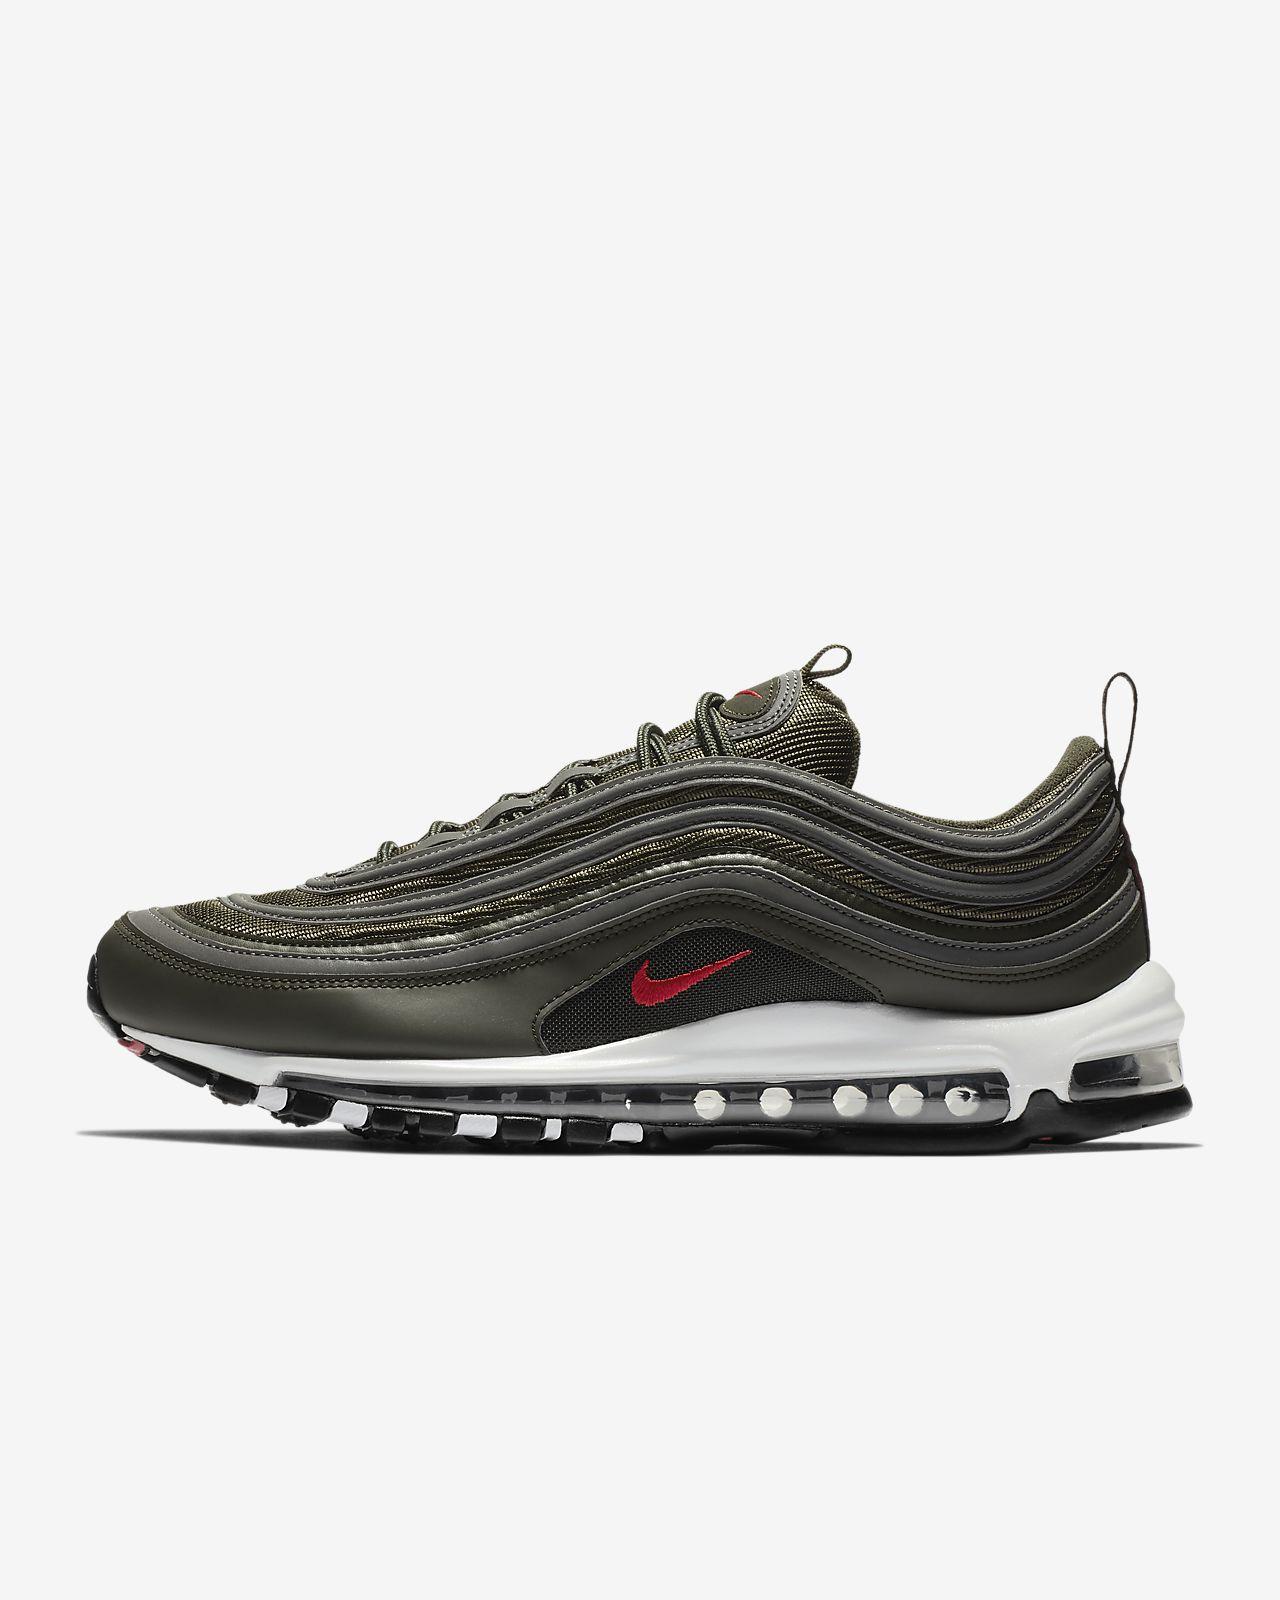 7e69641af073 Nike Air Max 97 Men s Shoe. Nike.com AT